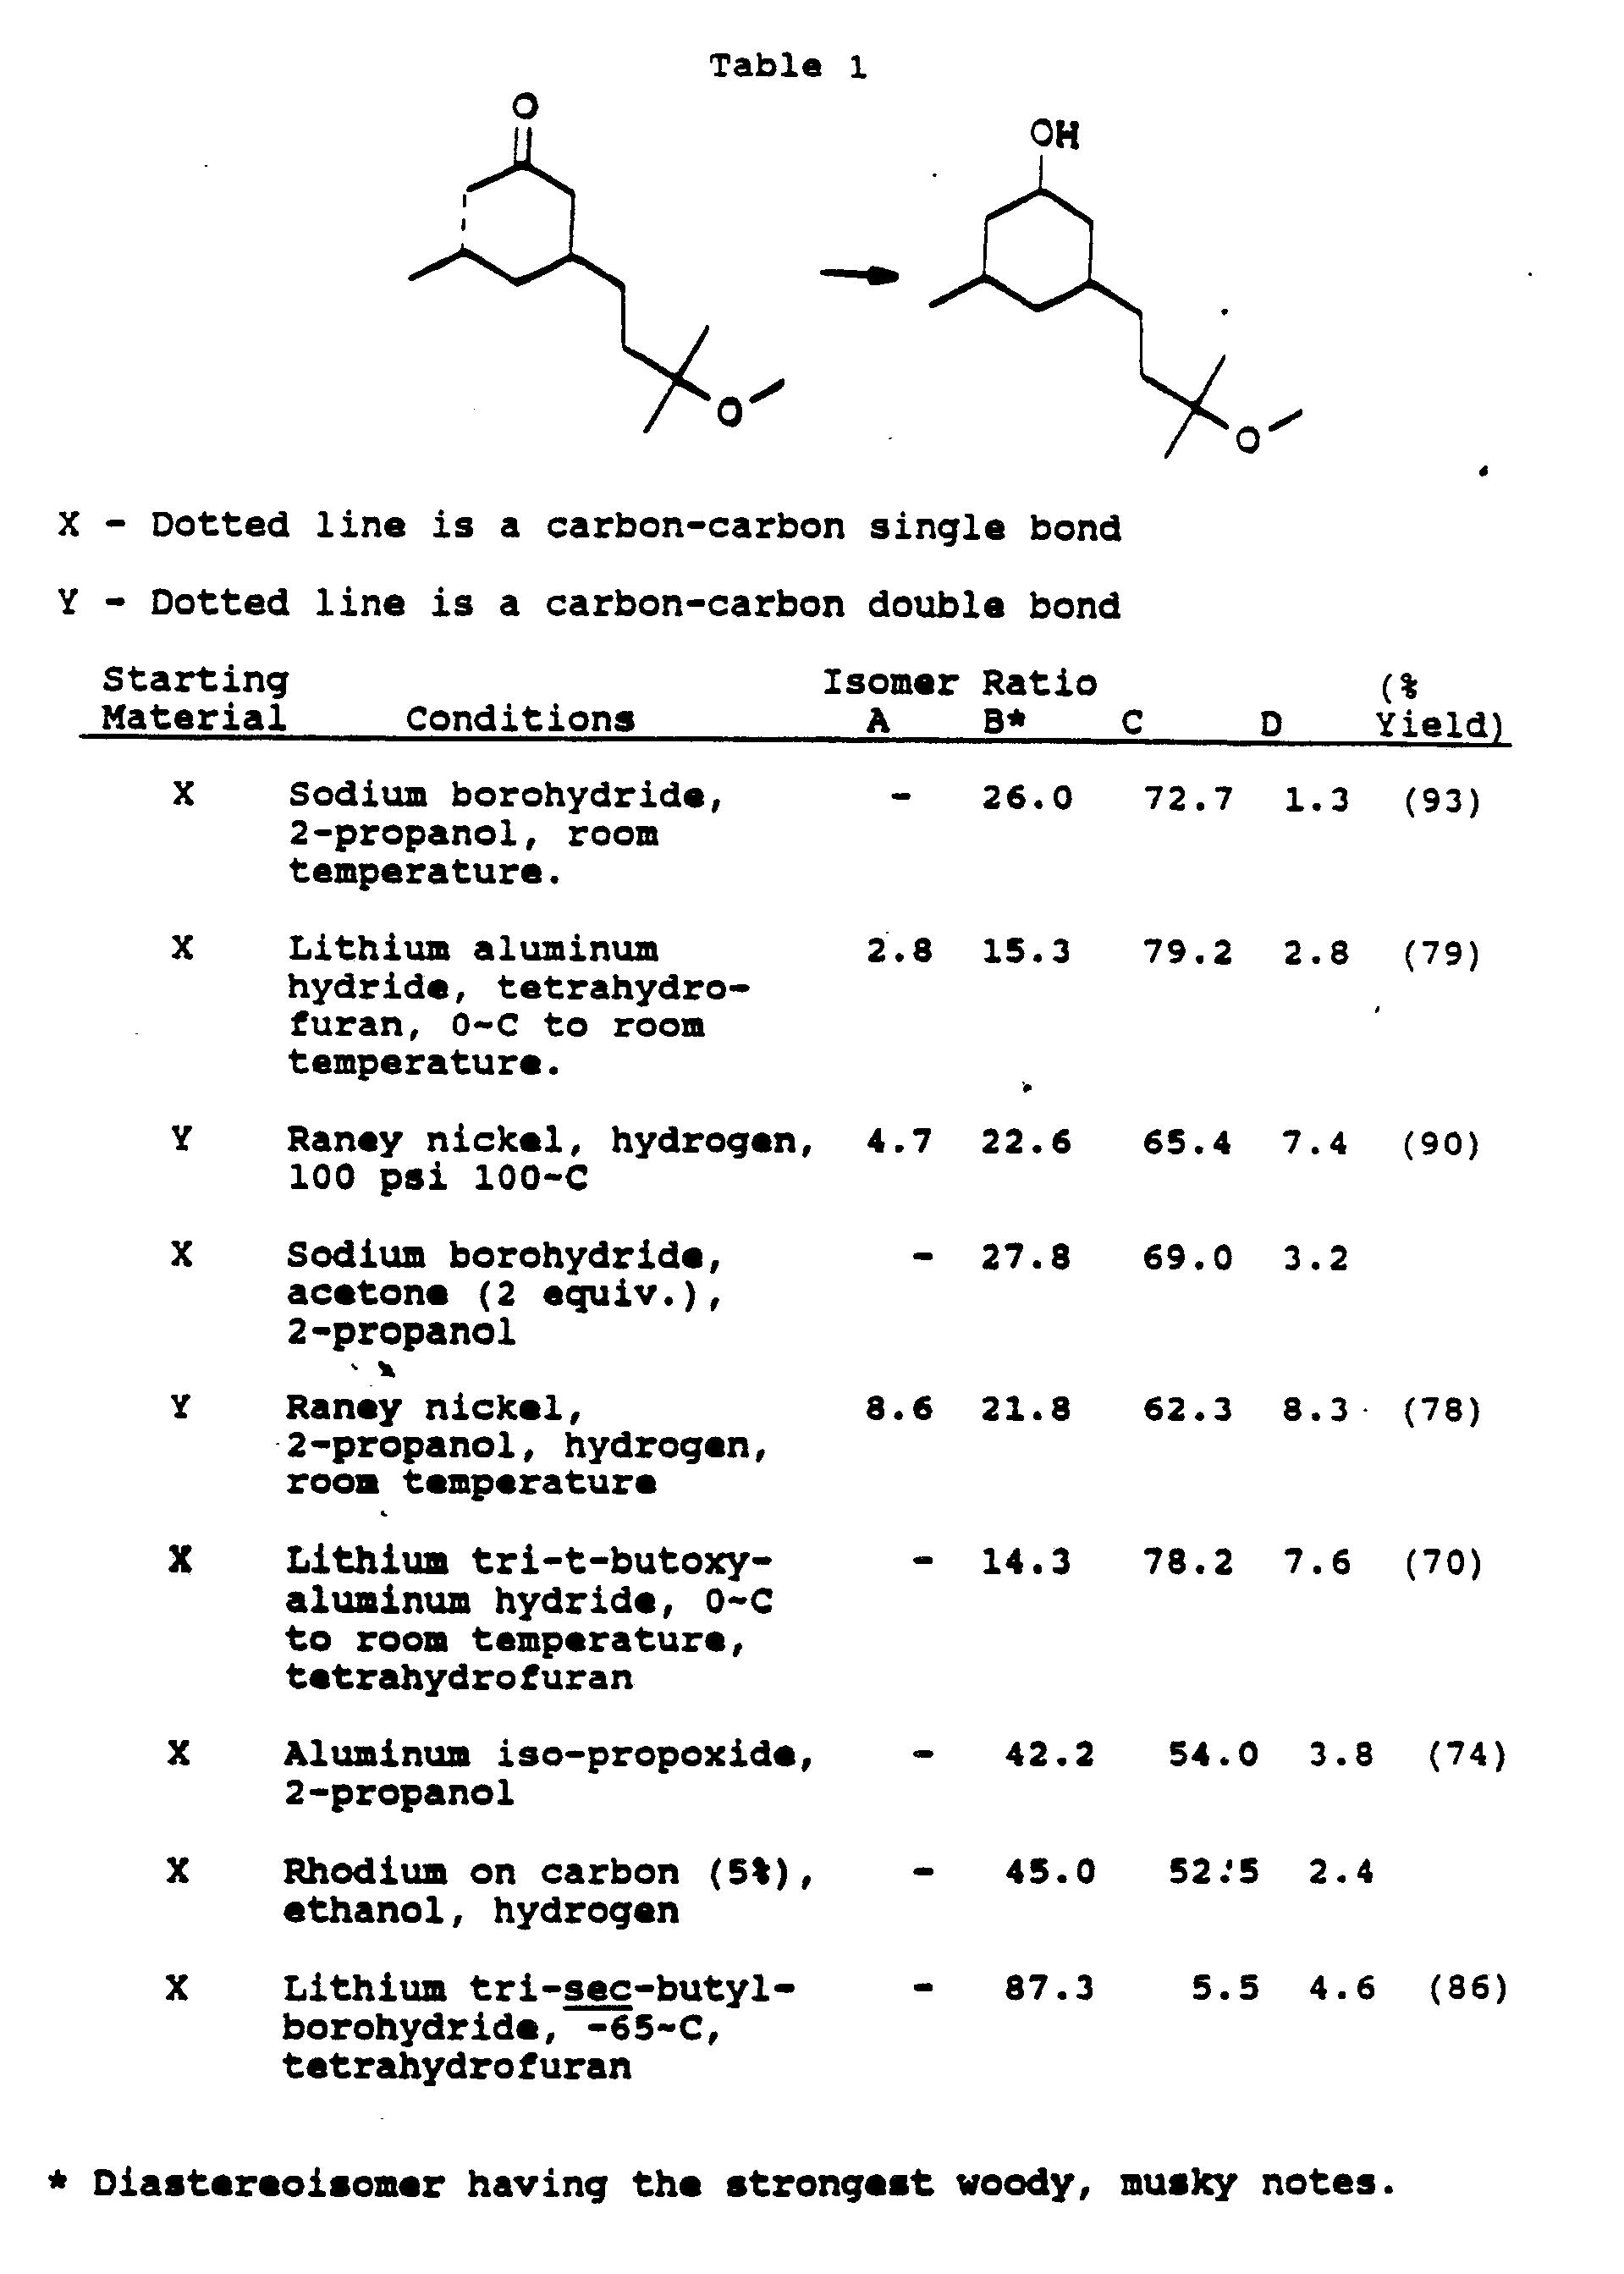 Sandalwood odorants - Patent 0373556